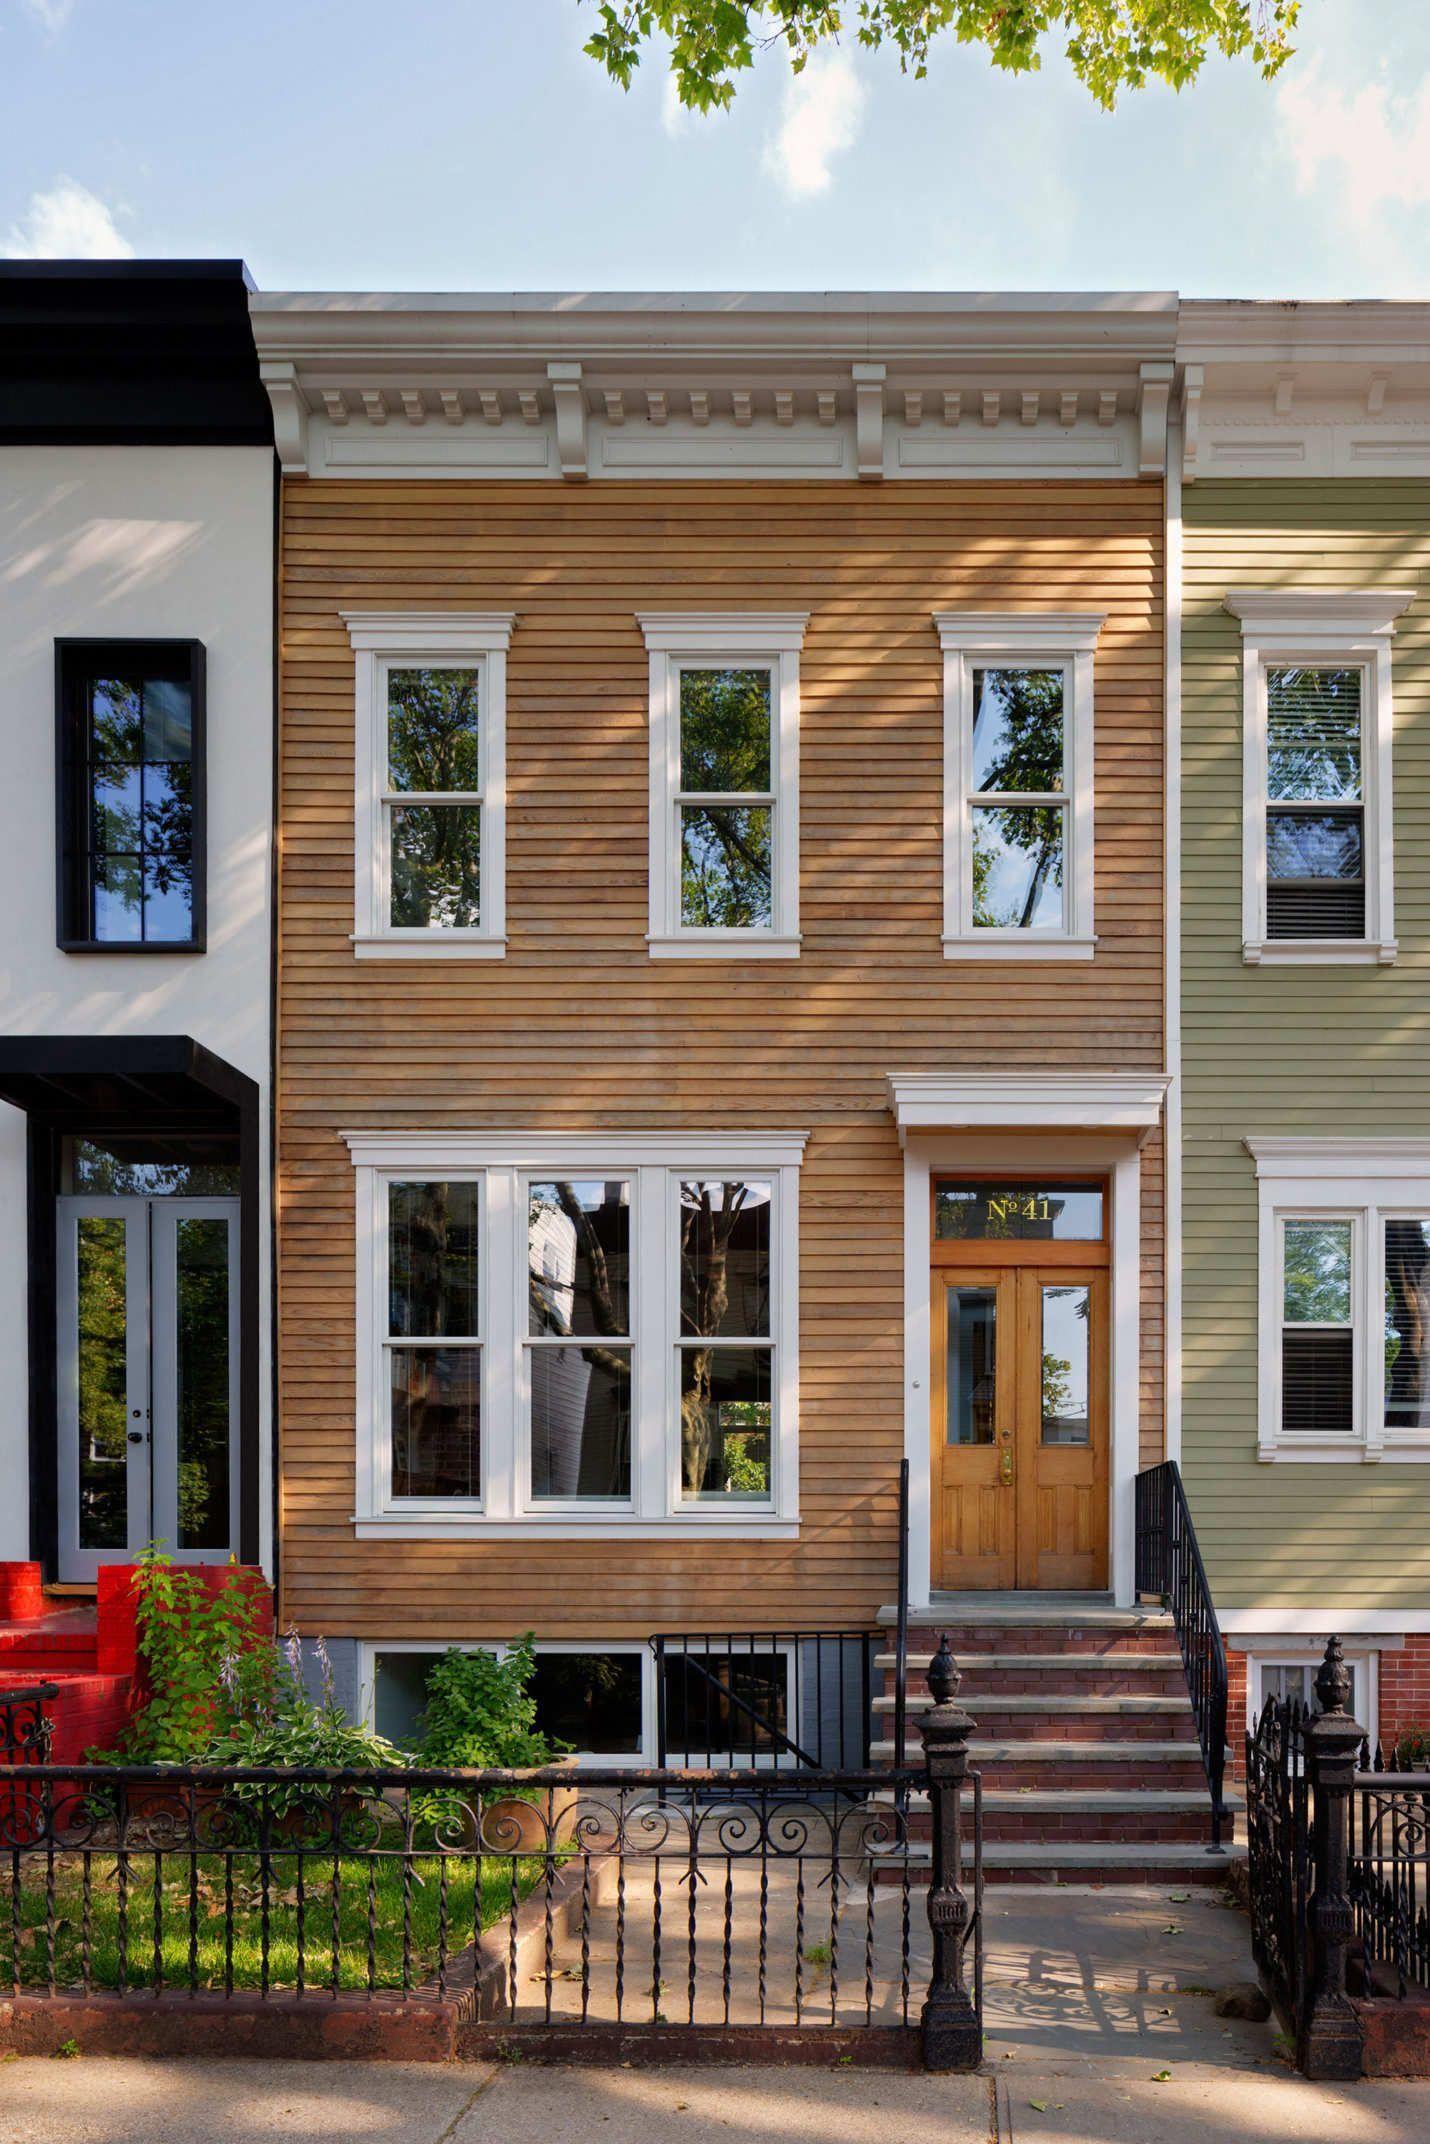 Best Home Decoration Stores Homedecorationwithwood Id 3757156020 Townhouse Exterior Exterior Design Interior Design Programs